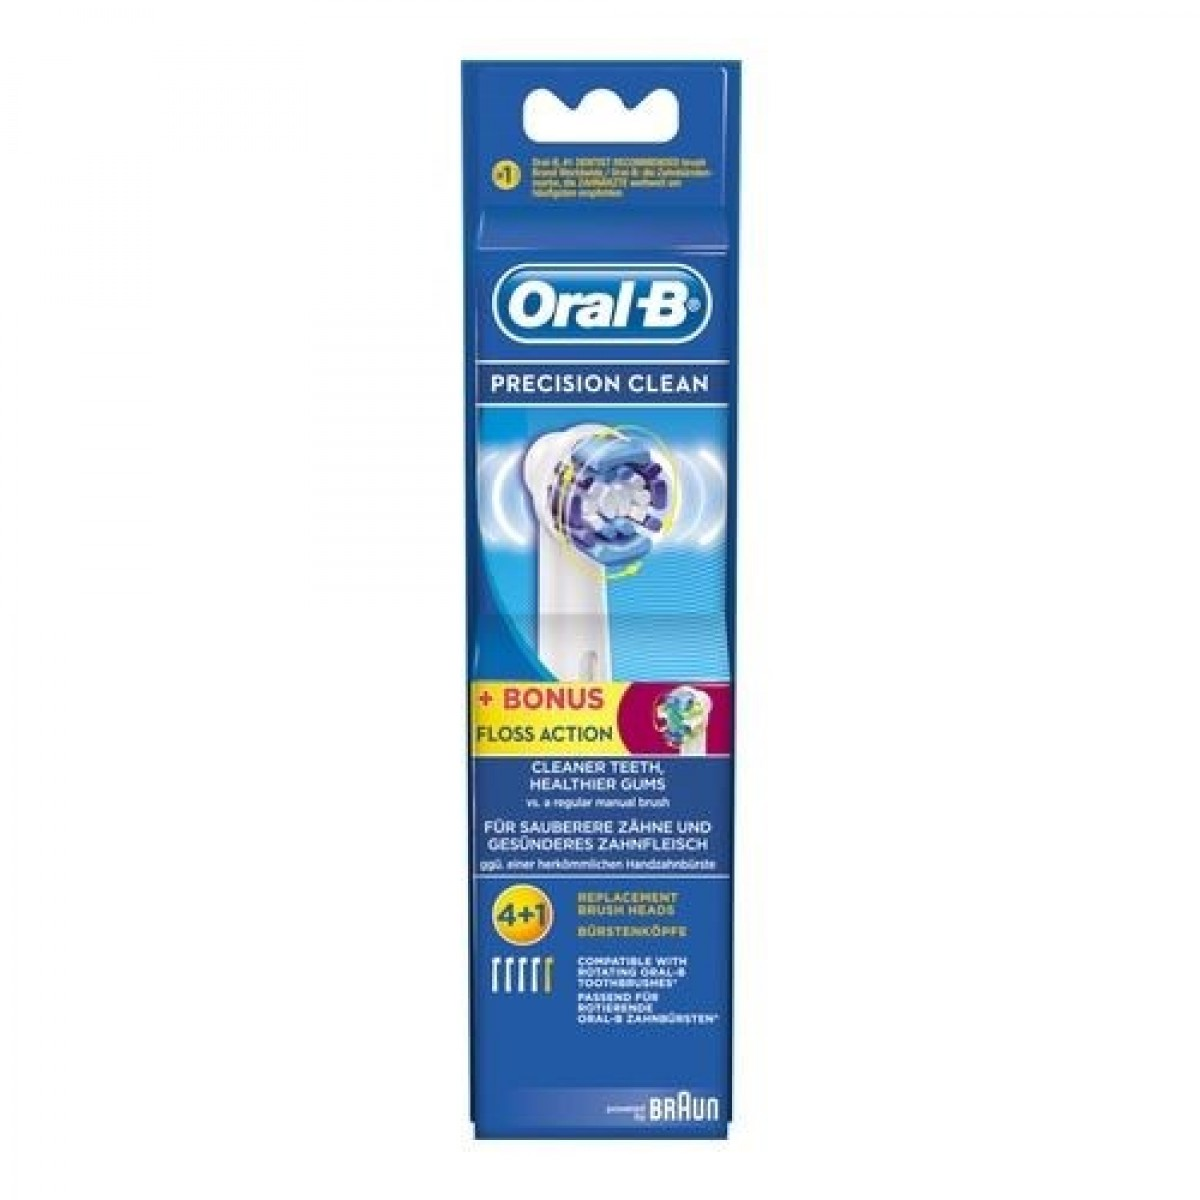 ORAL-B Børstehoveder precision clean 4 stk + floss action 1 stk